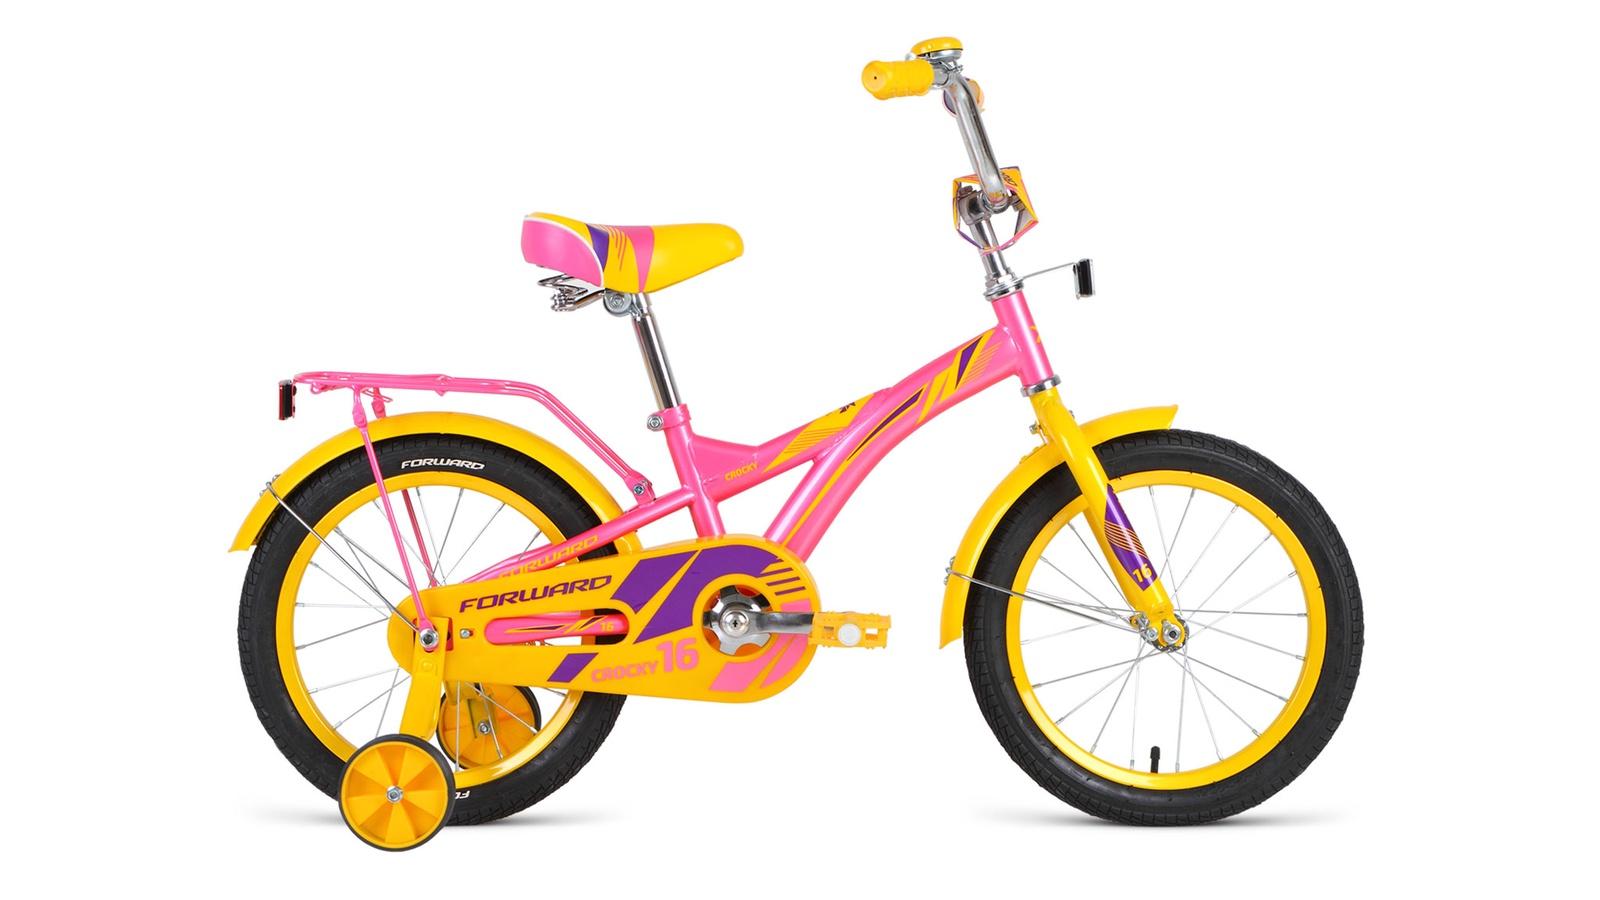 Велосипед Forward Crocky 16 2019 розовый велосипед forward yukon 1 0 2016